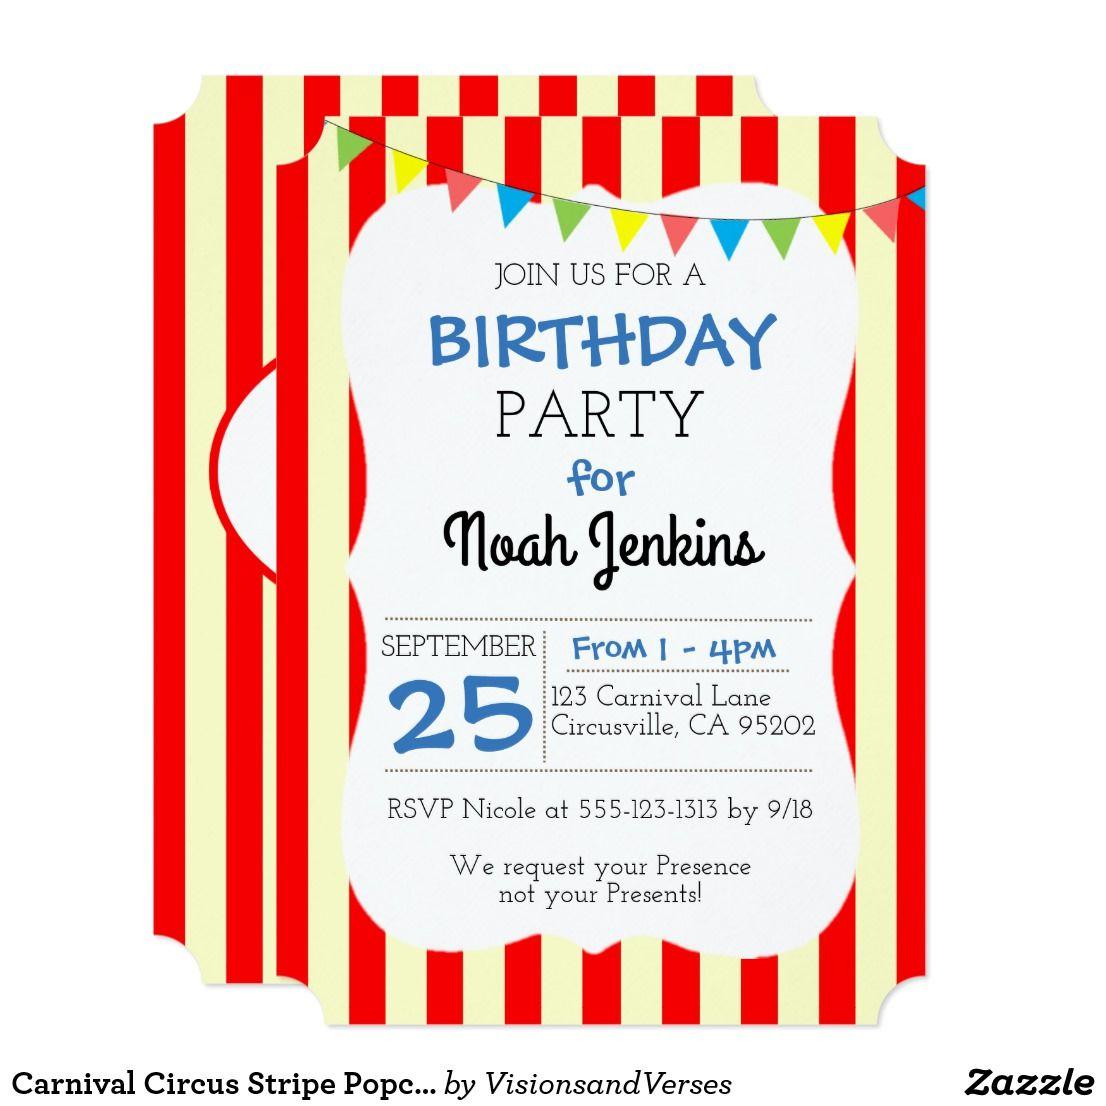 Carnival Circus Stripe Popcorn Party Invitation | Party central